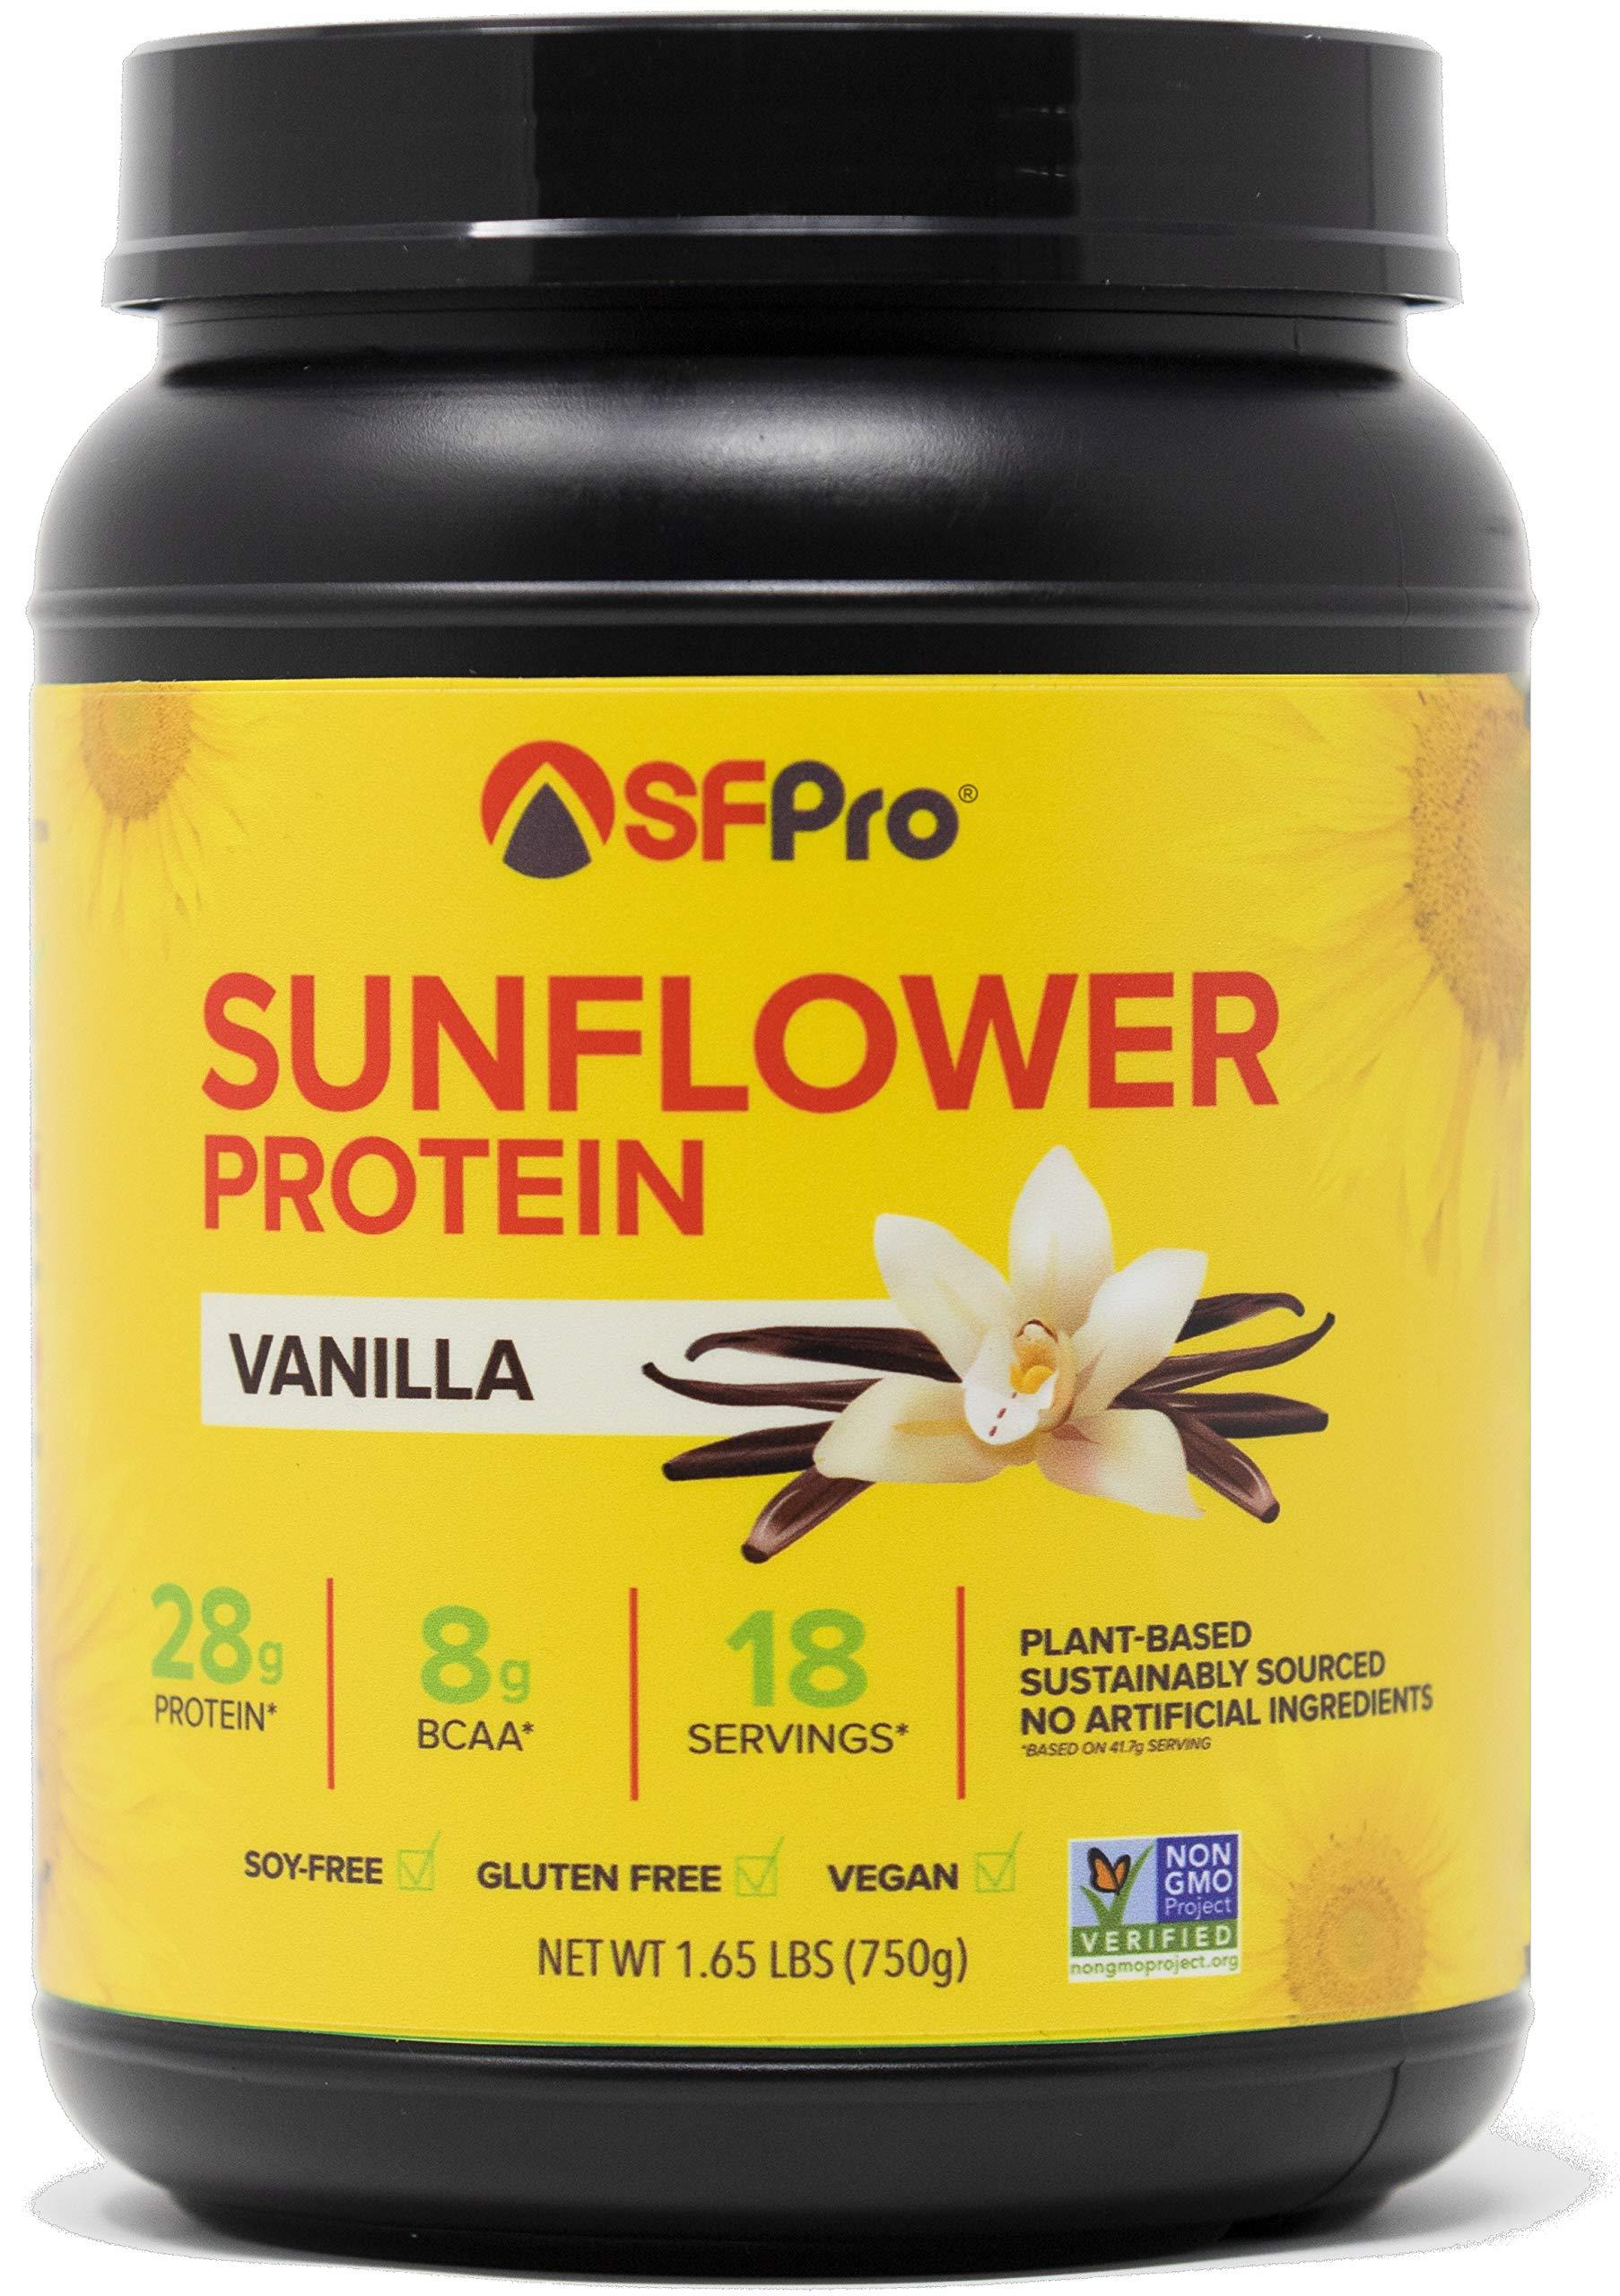 Plant Based Vegan Protein Powder by SFPro (Vanilla)   Premium Sunflower Protein, Single Source   High BCAAs, Balanced Amino Acids, All Natural   1.65lbs